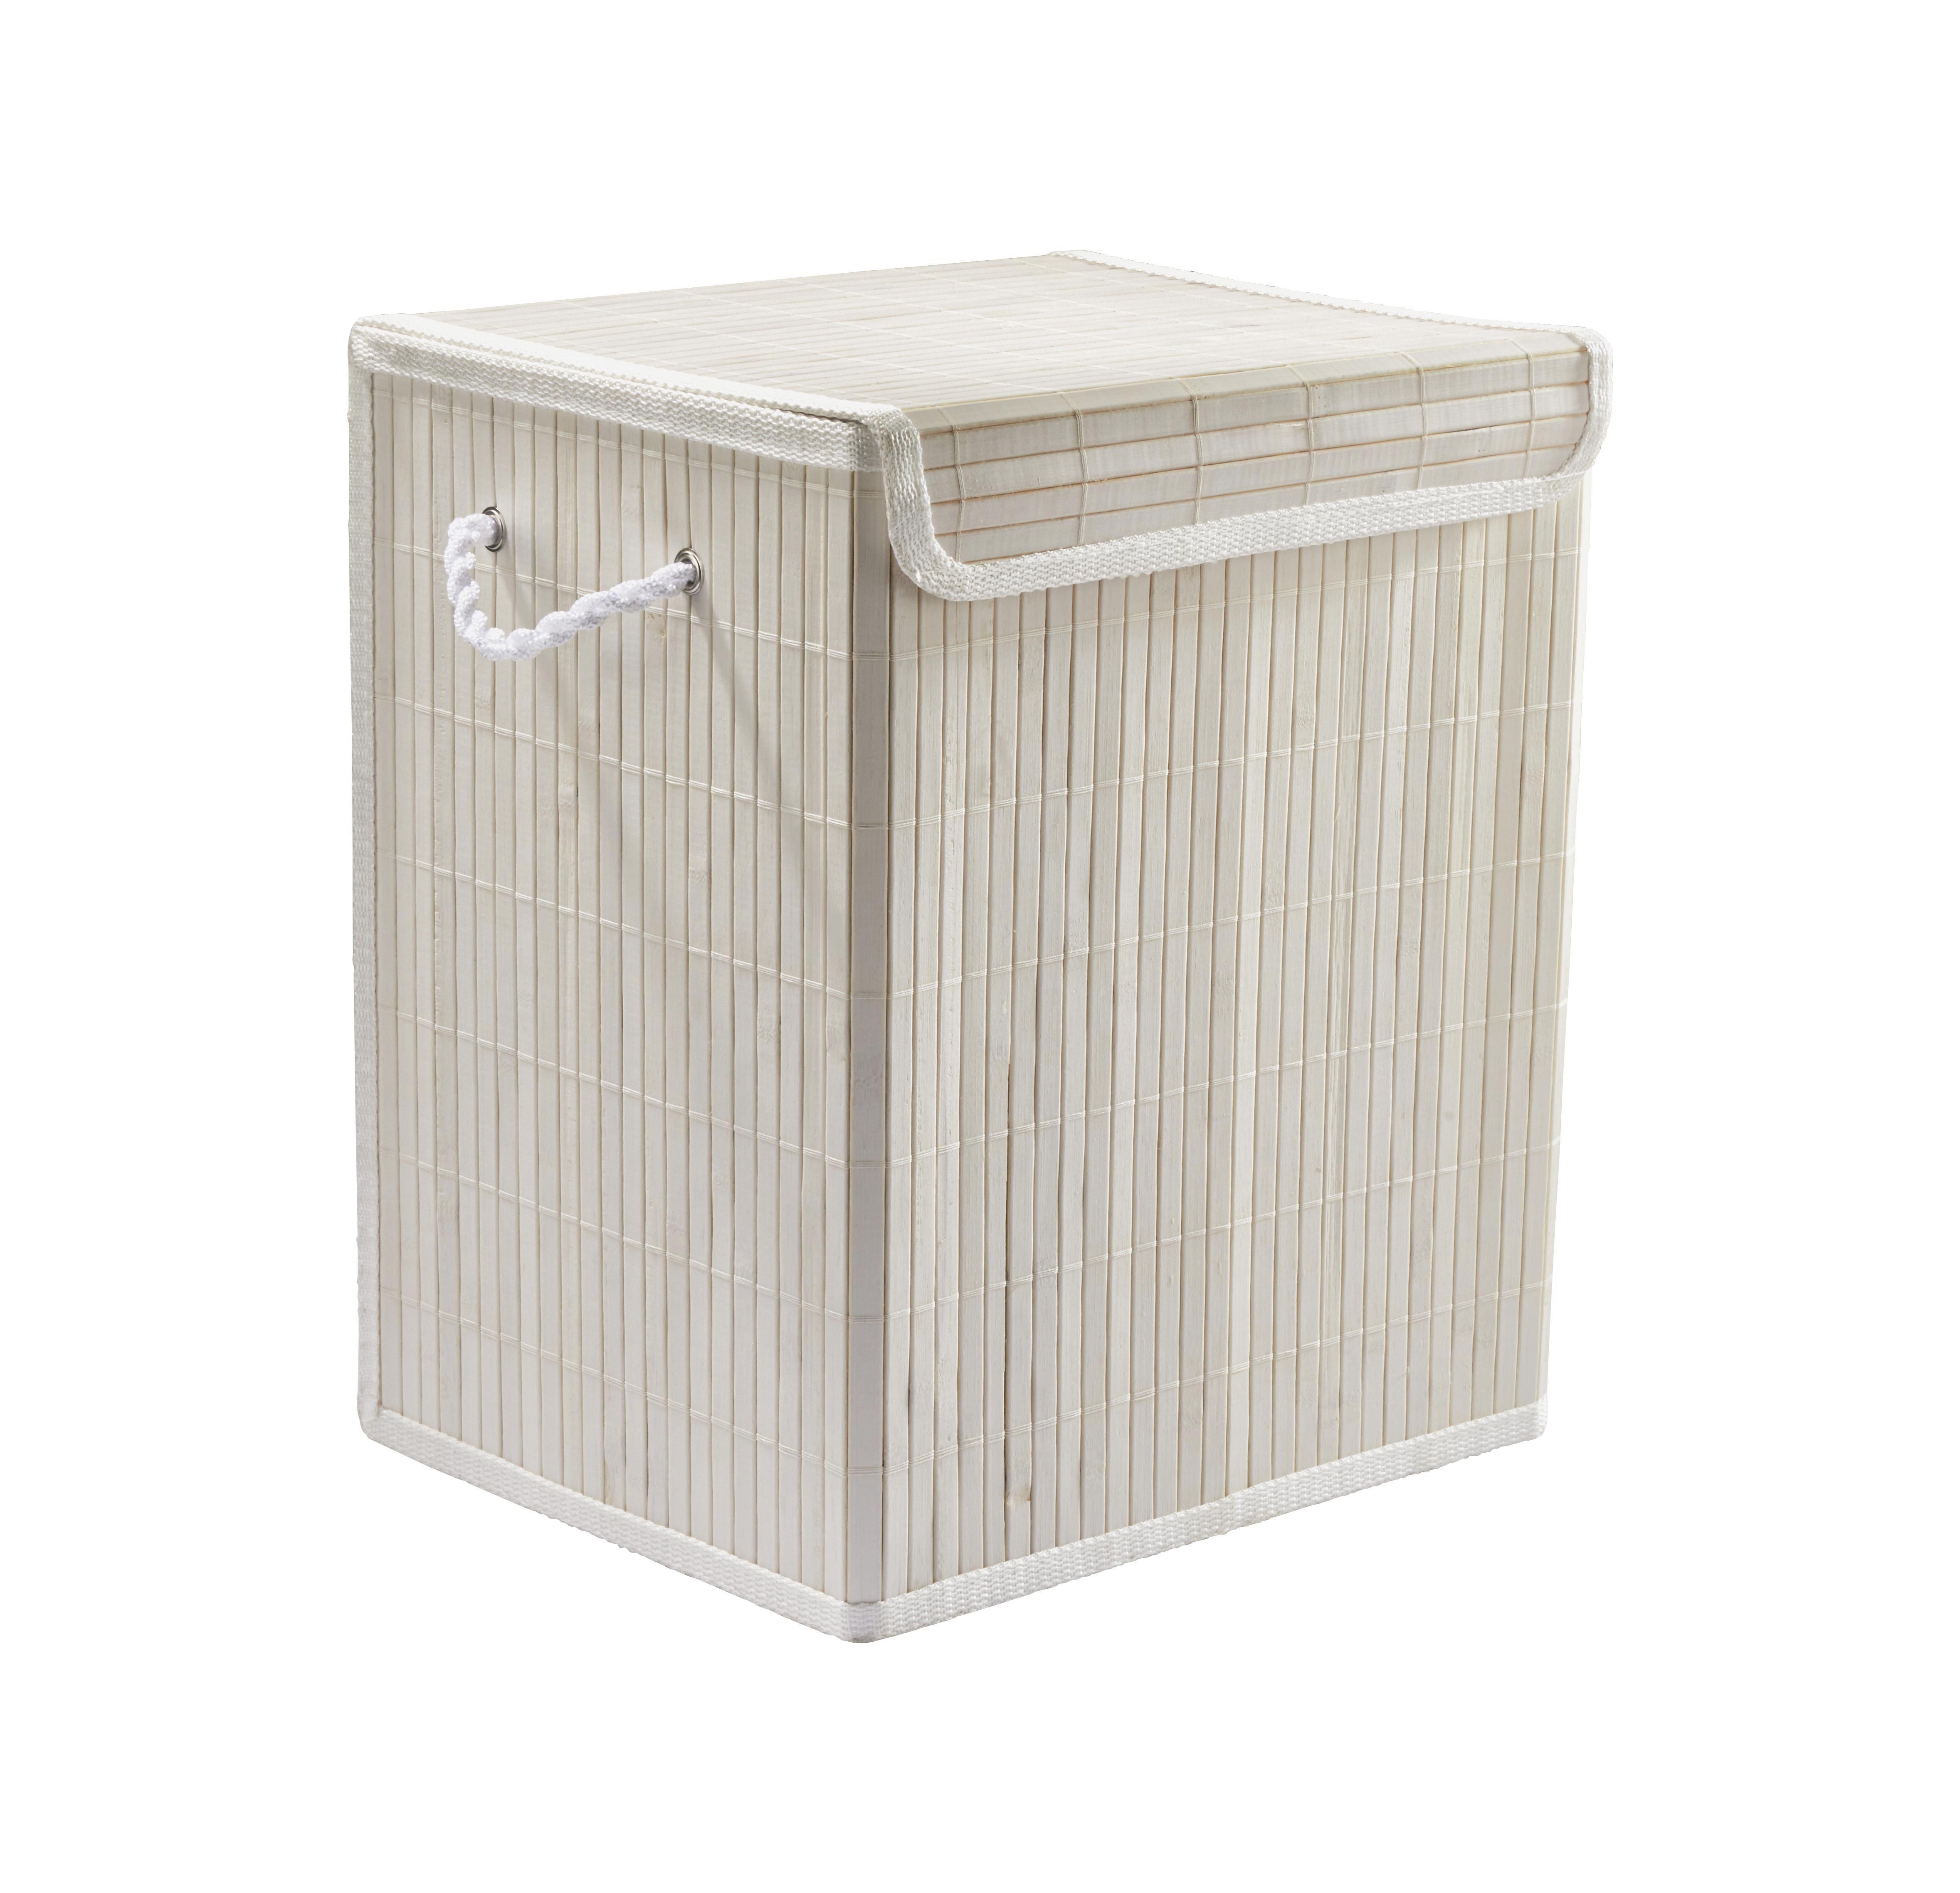 Szennyestartó Bamboo White - fehér, fa (37/28/40cm) - MÖMAX modern living